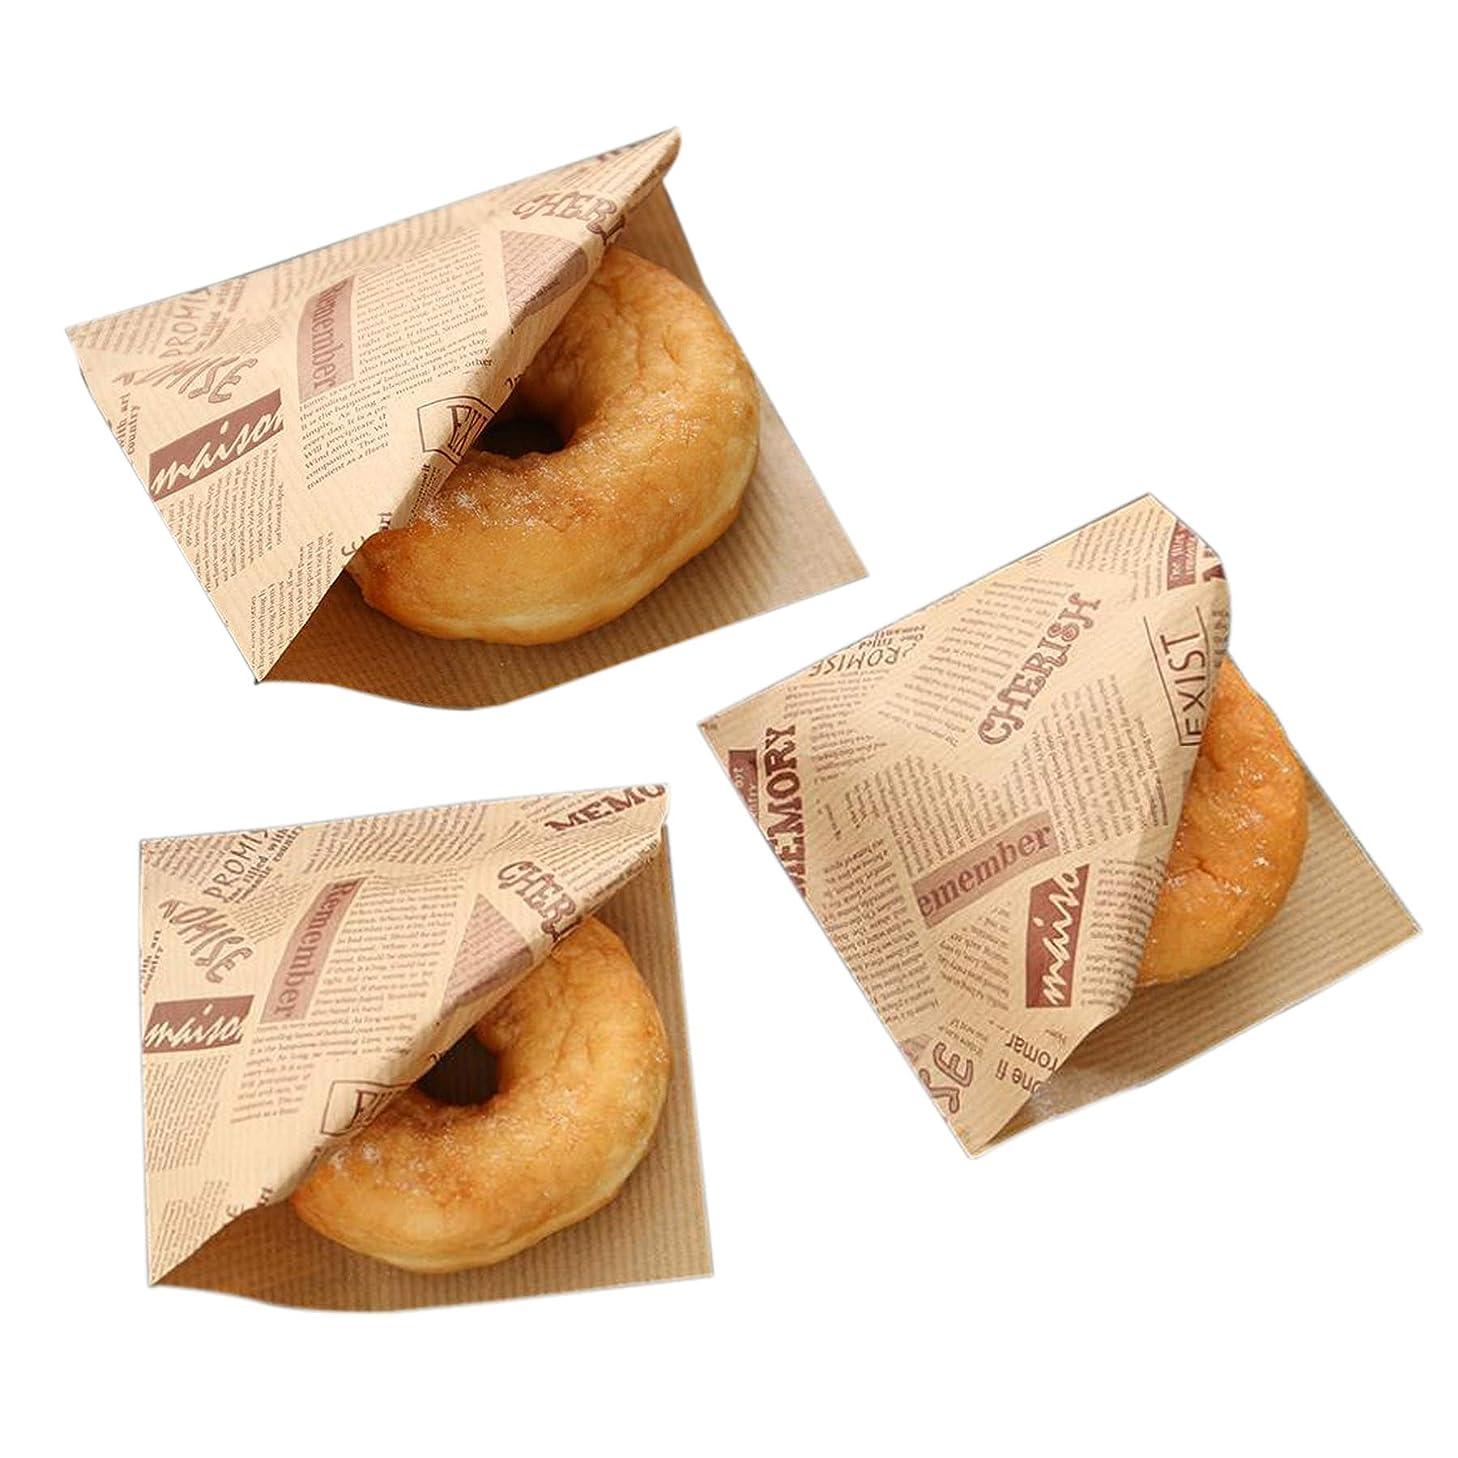 Funcoo 100 PCS 5x5'' Treat Bags Kraft Paper Take Out Bags Cookies Sandwich Snack Bags (Kraft)